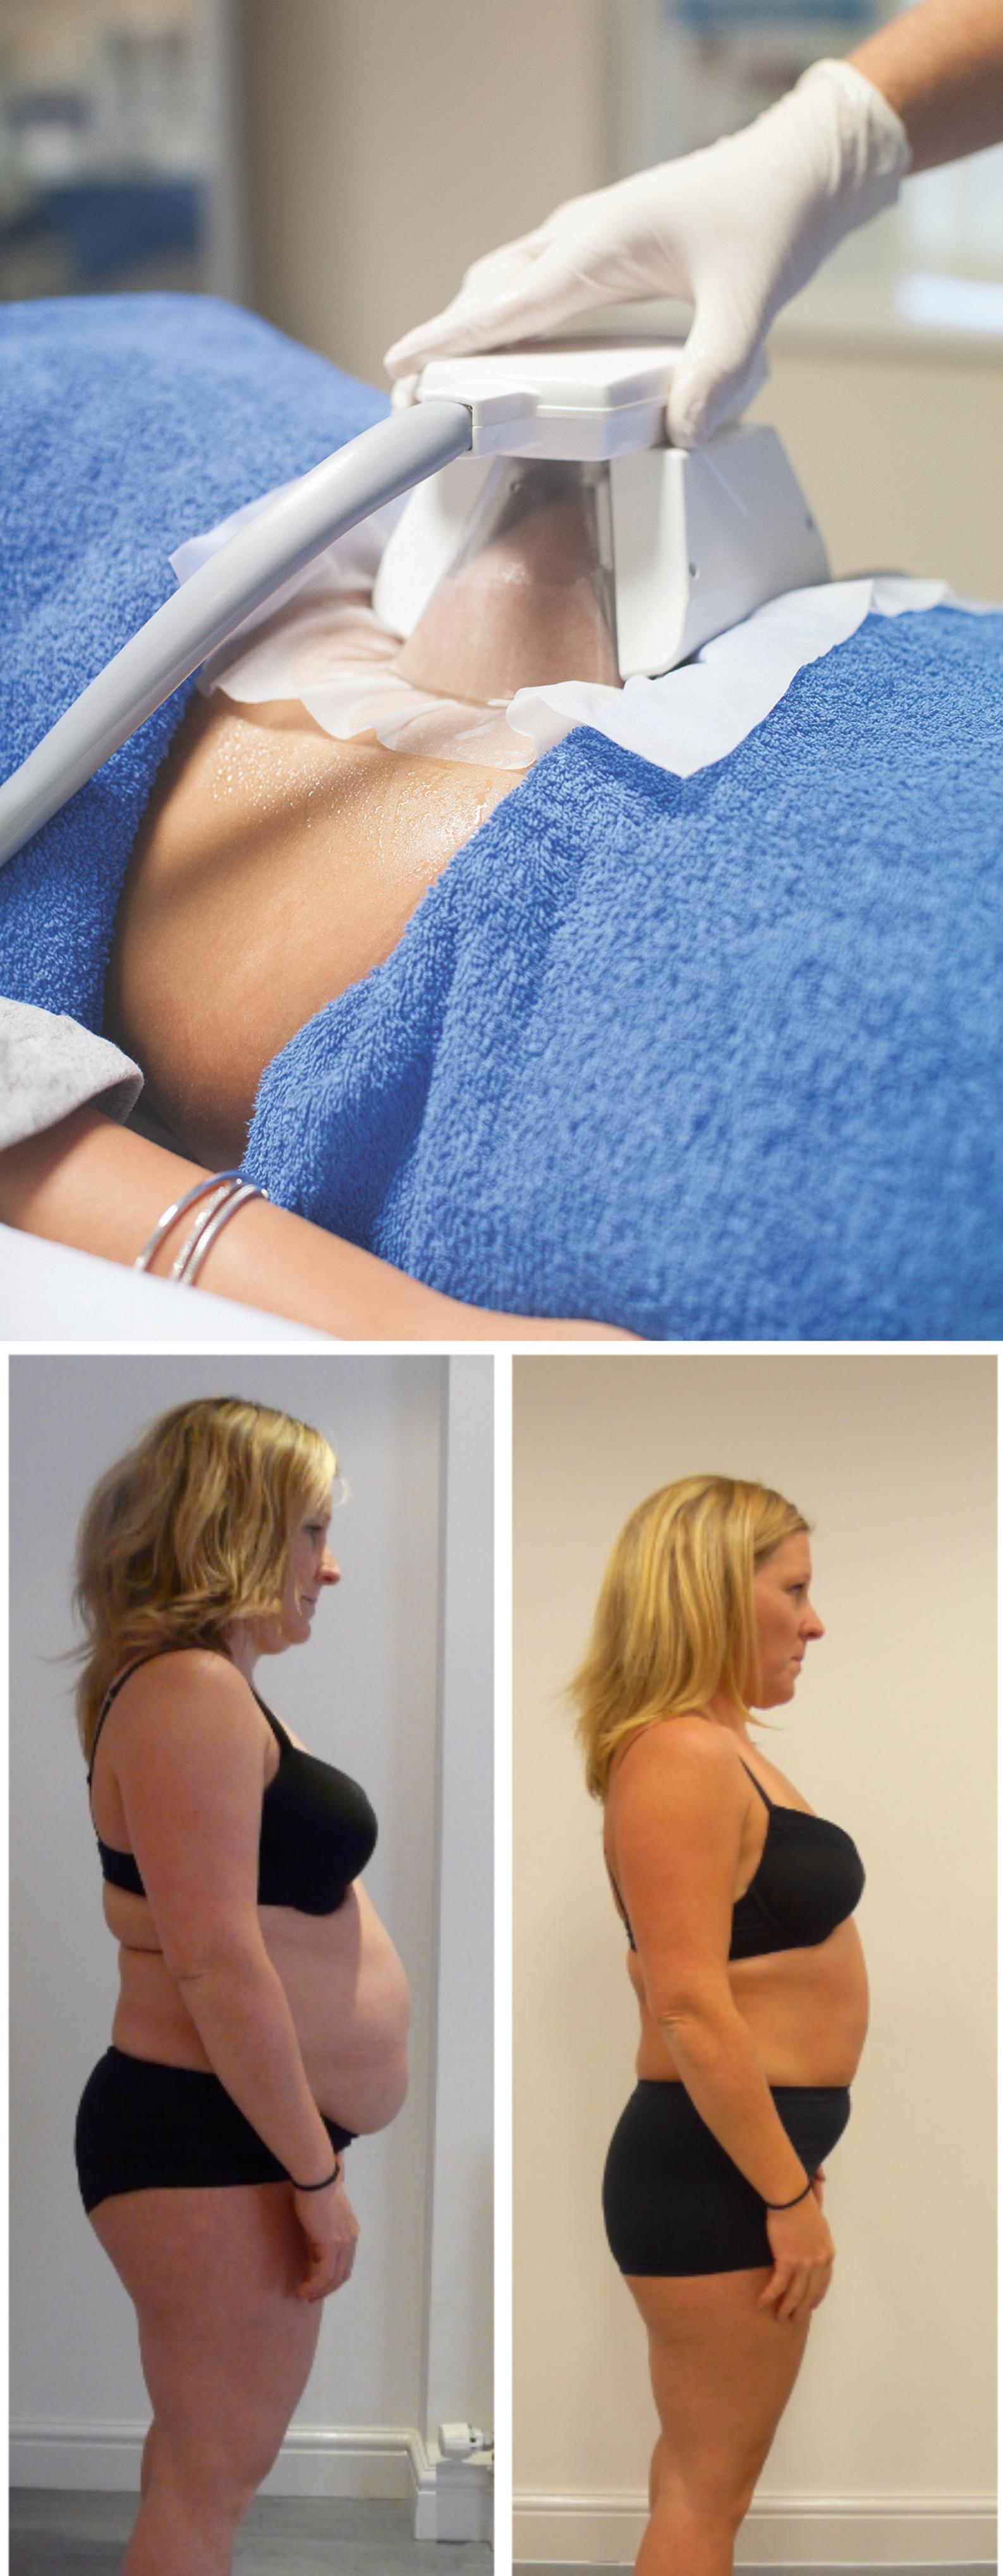 3D-Fat Freezing at 3D-lipo Leamington Spa treatment at 3d lipo leamington